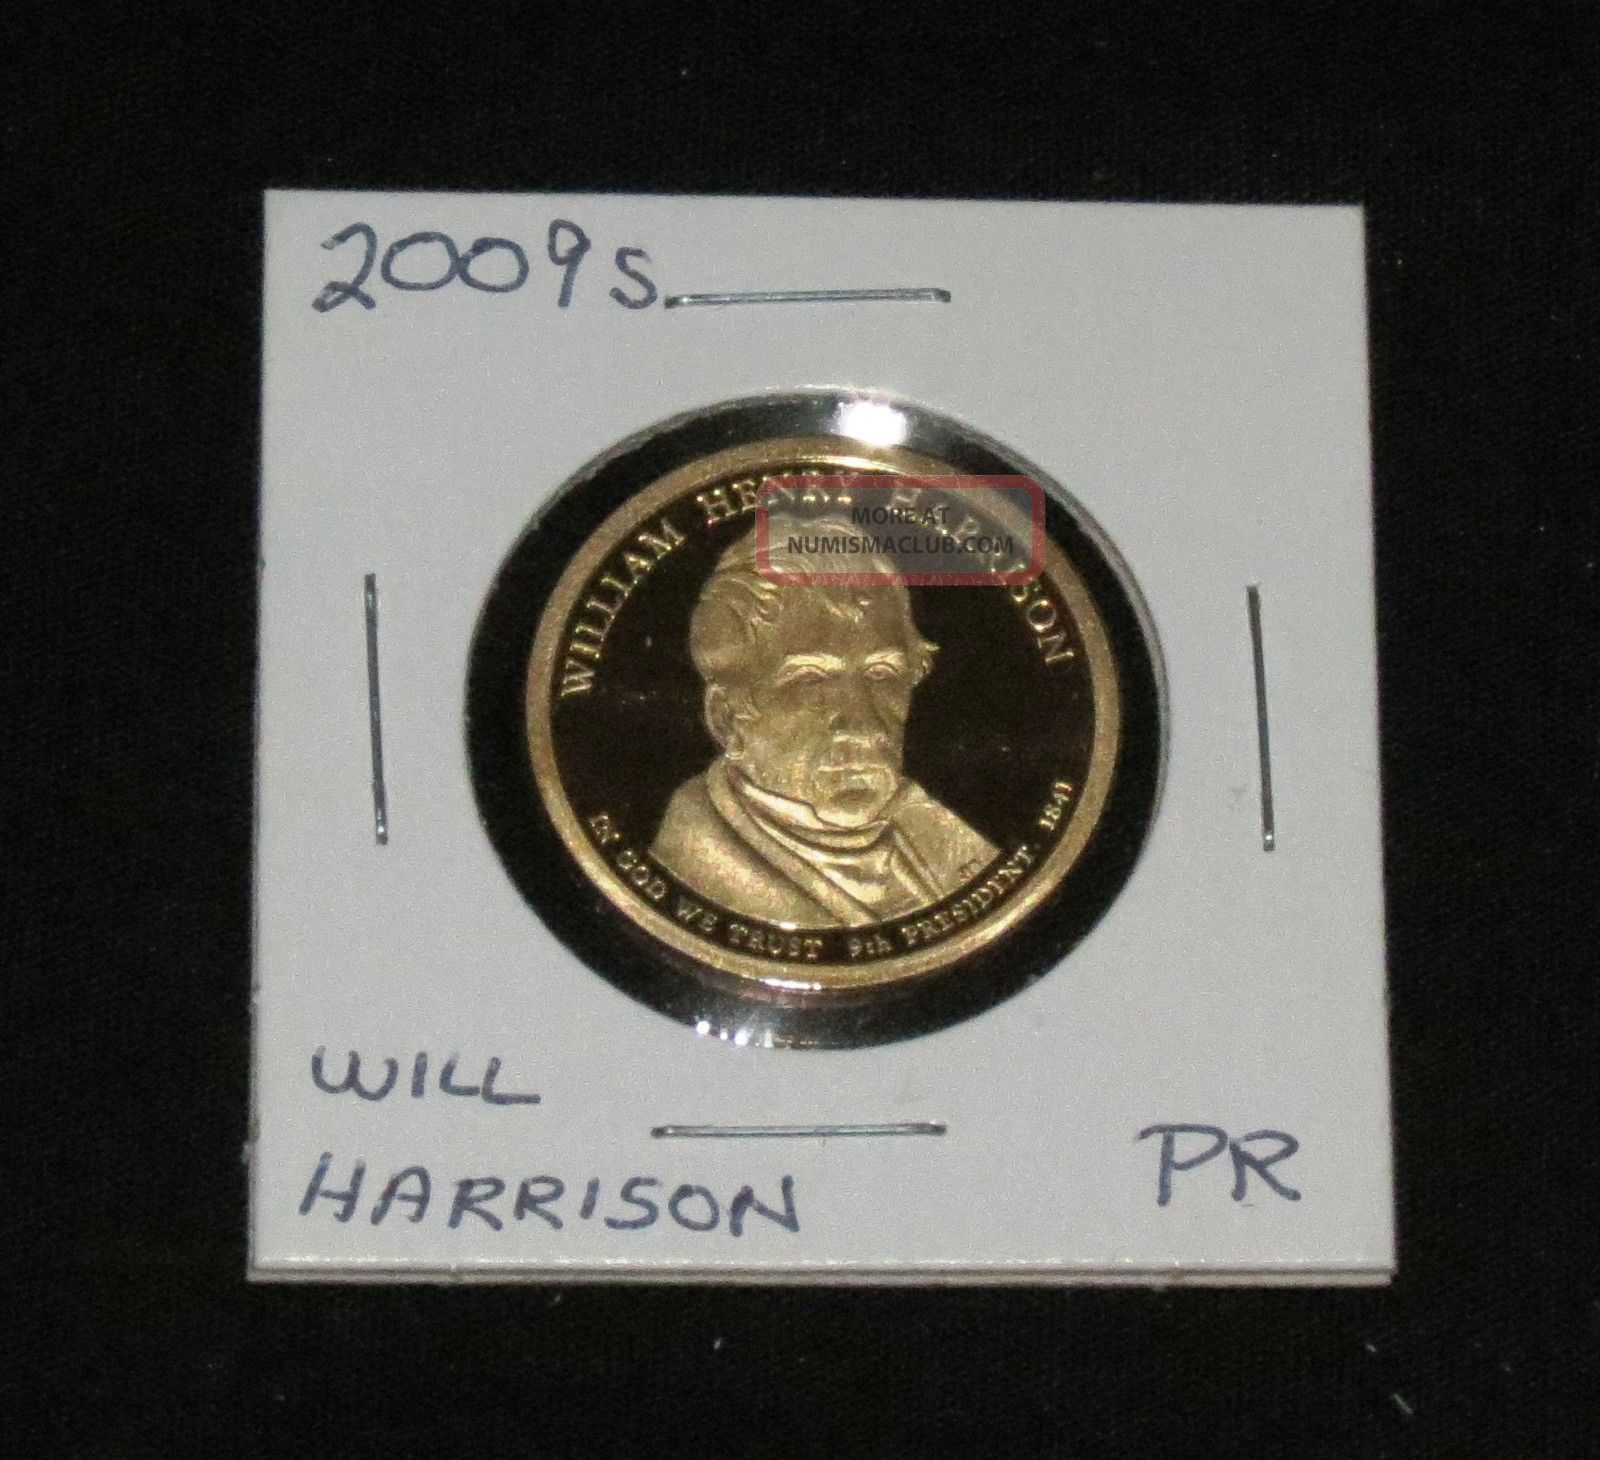 2009s Pres.  William Harrison Proof Dollars photo